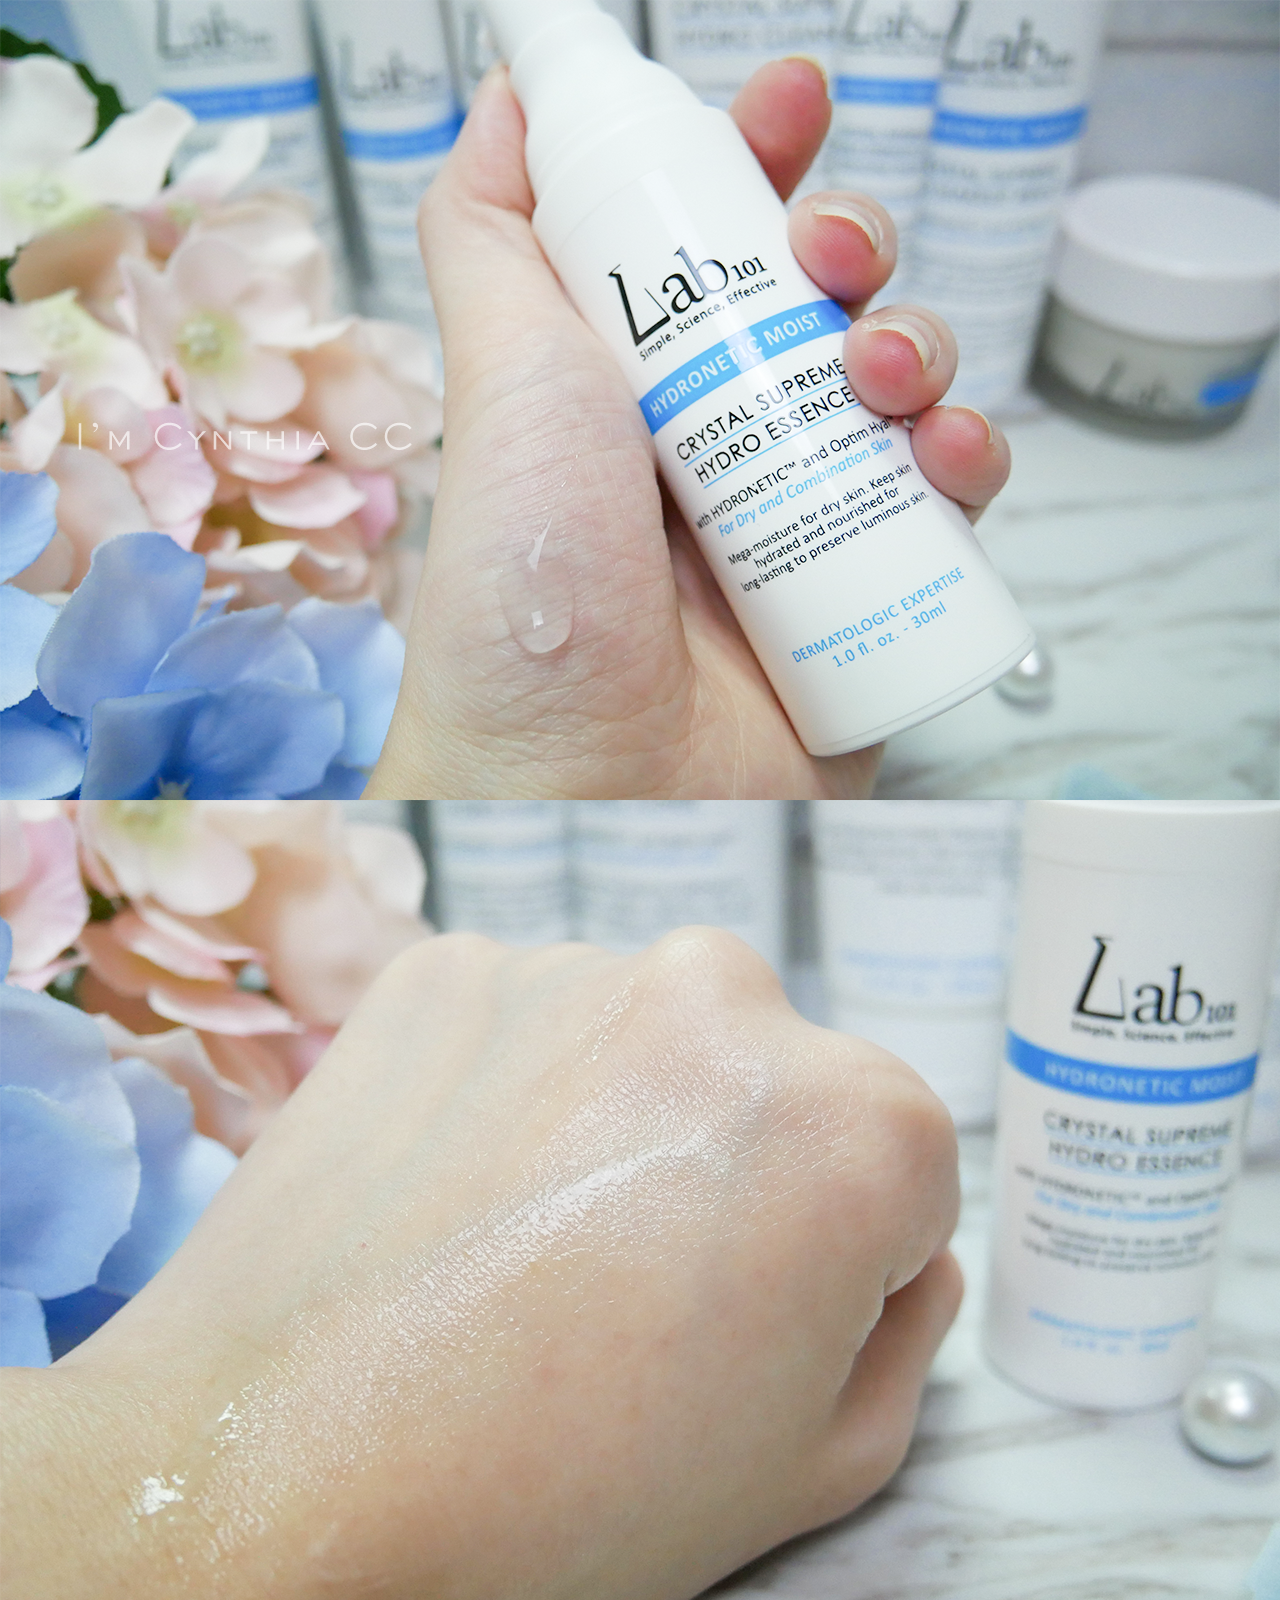 Lab101晶瑩精萃保濕精華和時空賦顏美肌膠原精華液